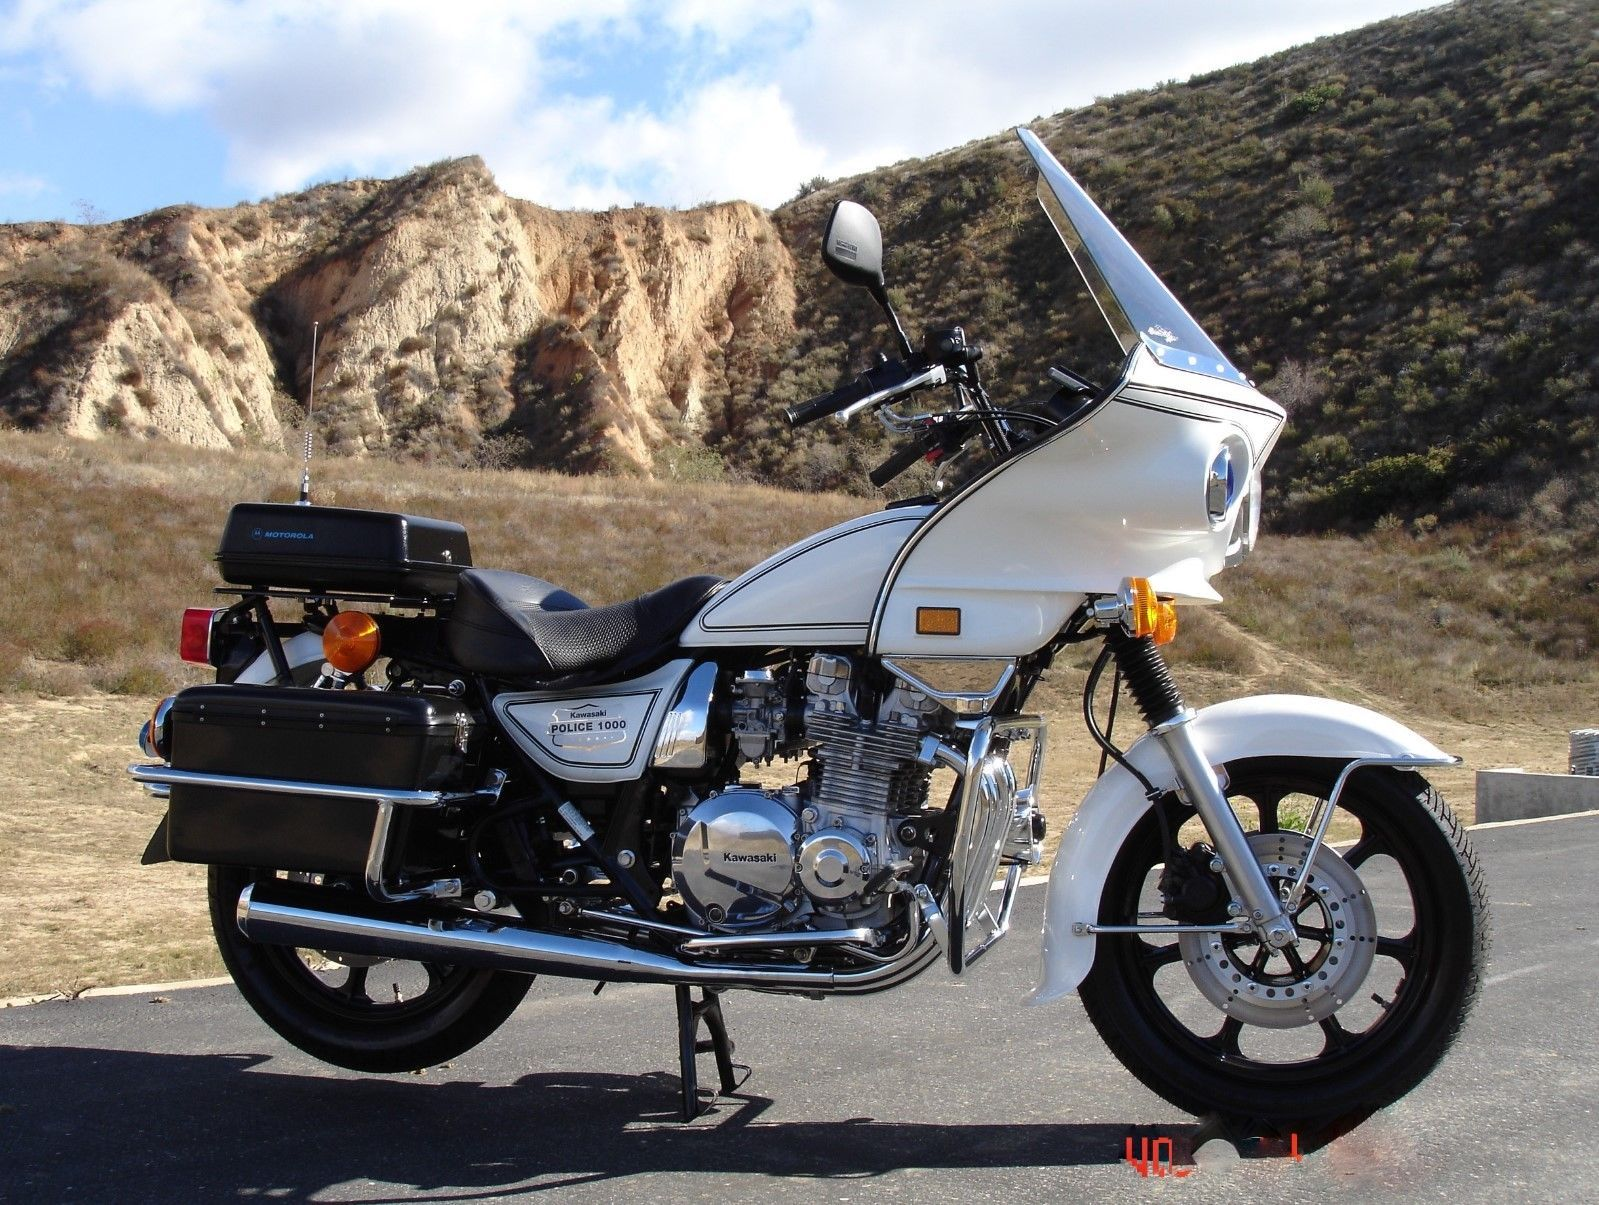 small resolution of 2000 kawasaki kz 1000 kz1000p police show bike spare bike nos ebay link